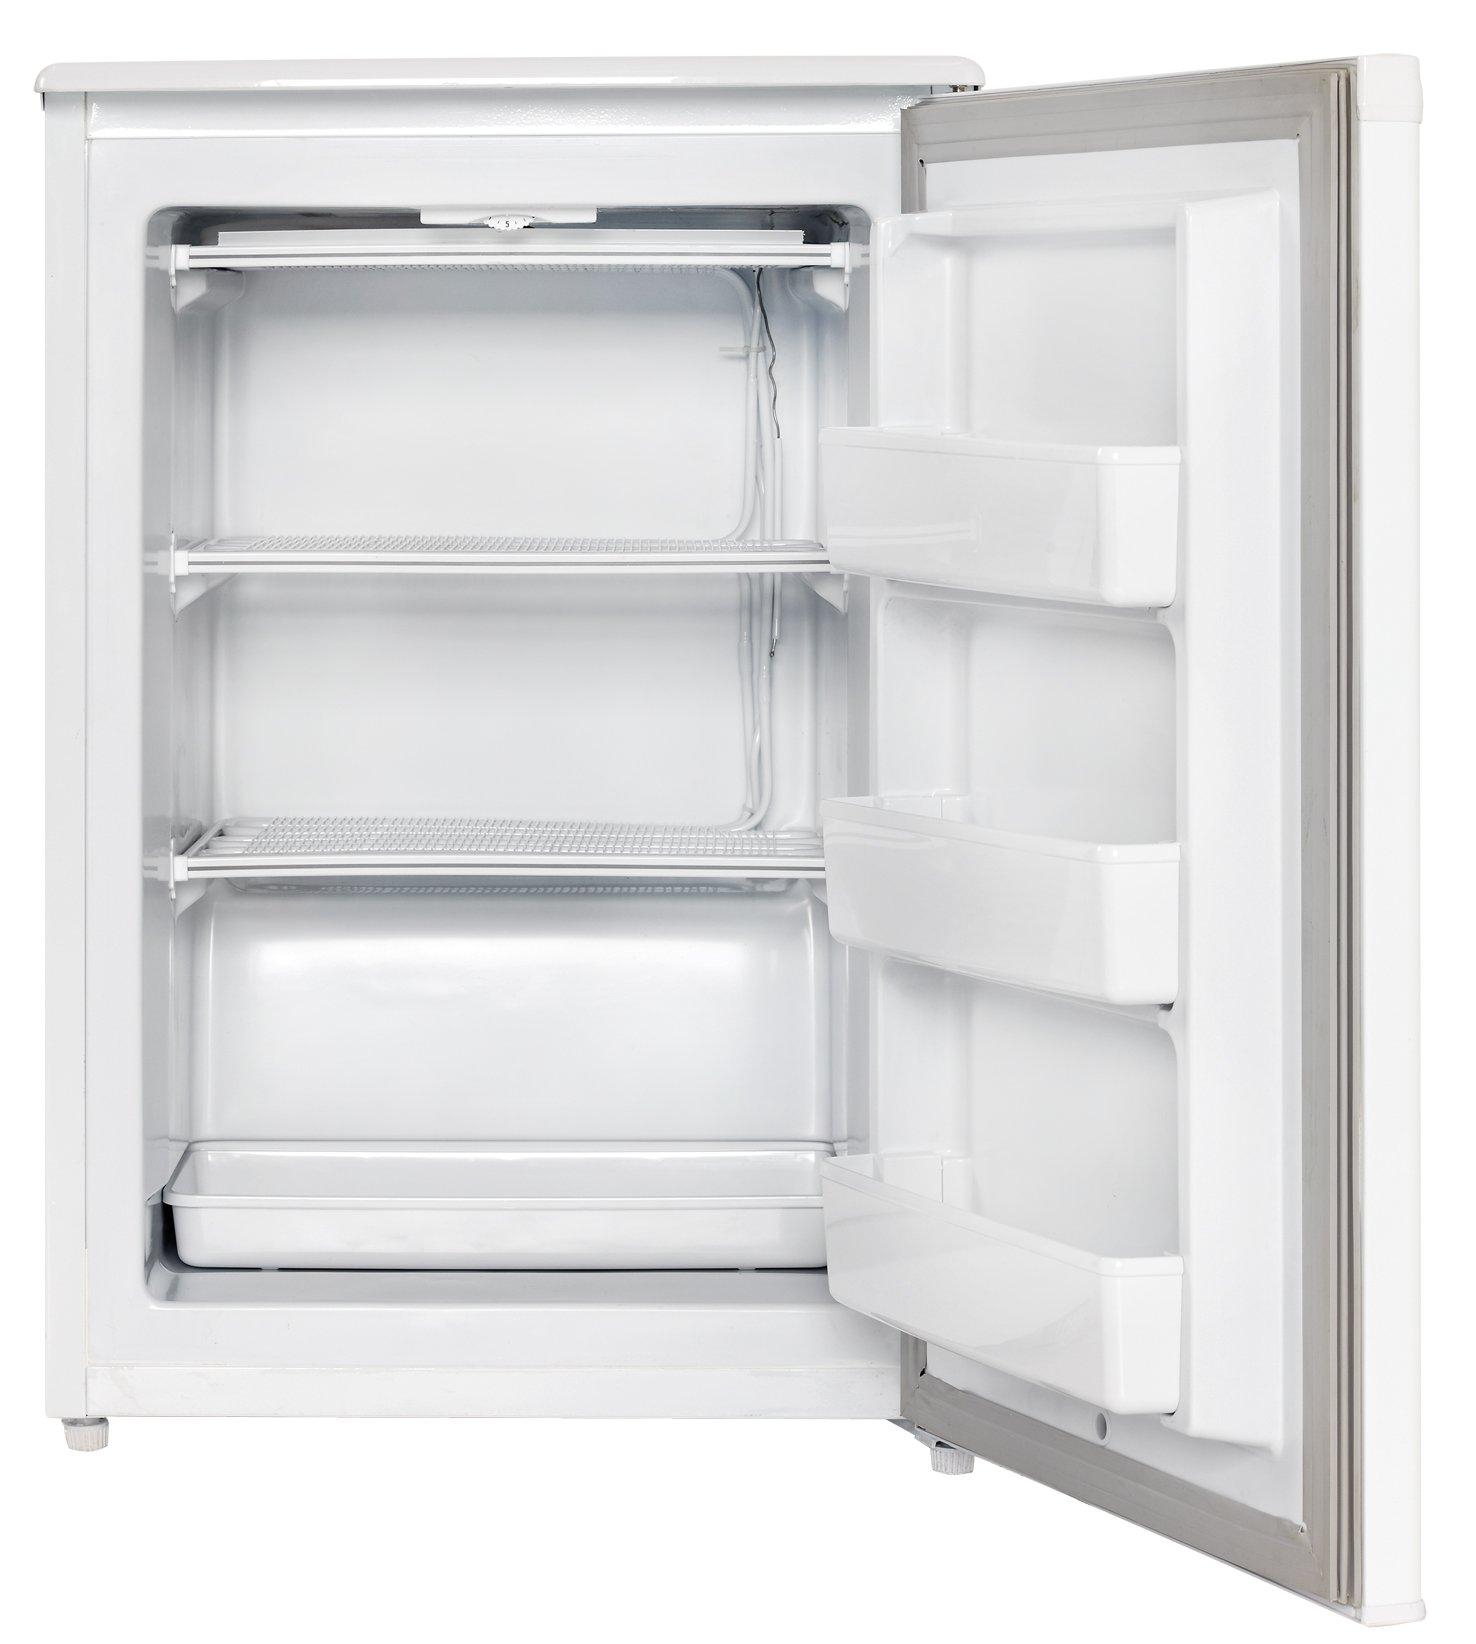 Danby DUFM043A1WDD 4.3 Cubic Feet Upright Freezer, White by Danby (Image #5)